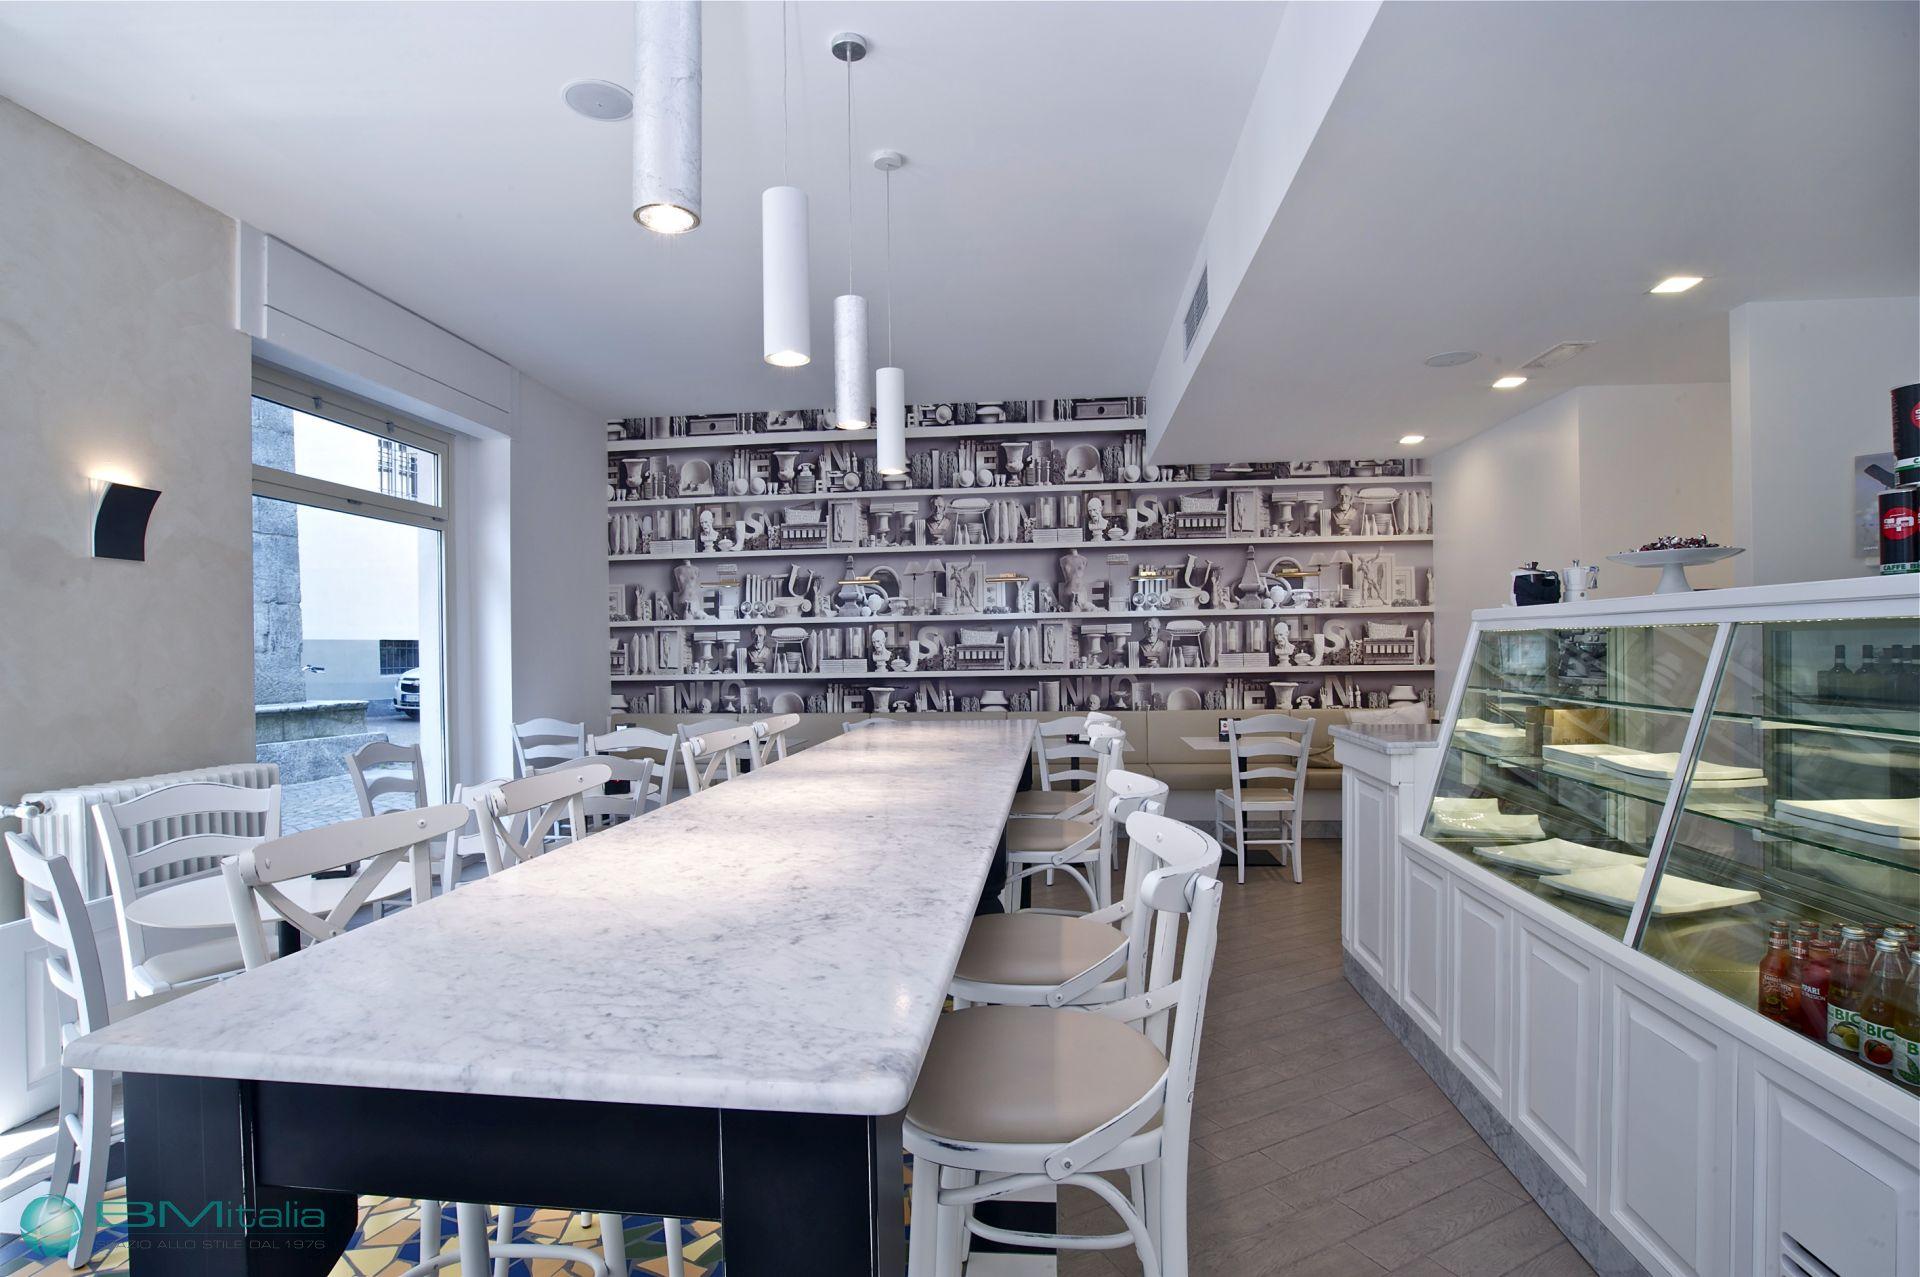 Progettazione consulenza e arredamenti per caffetteria for Af arredamenti